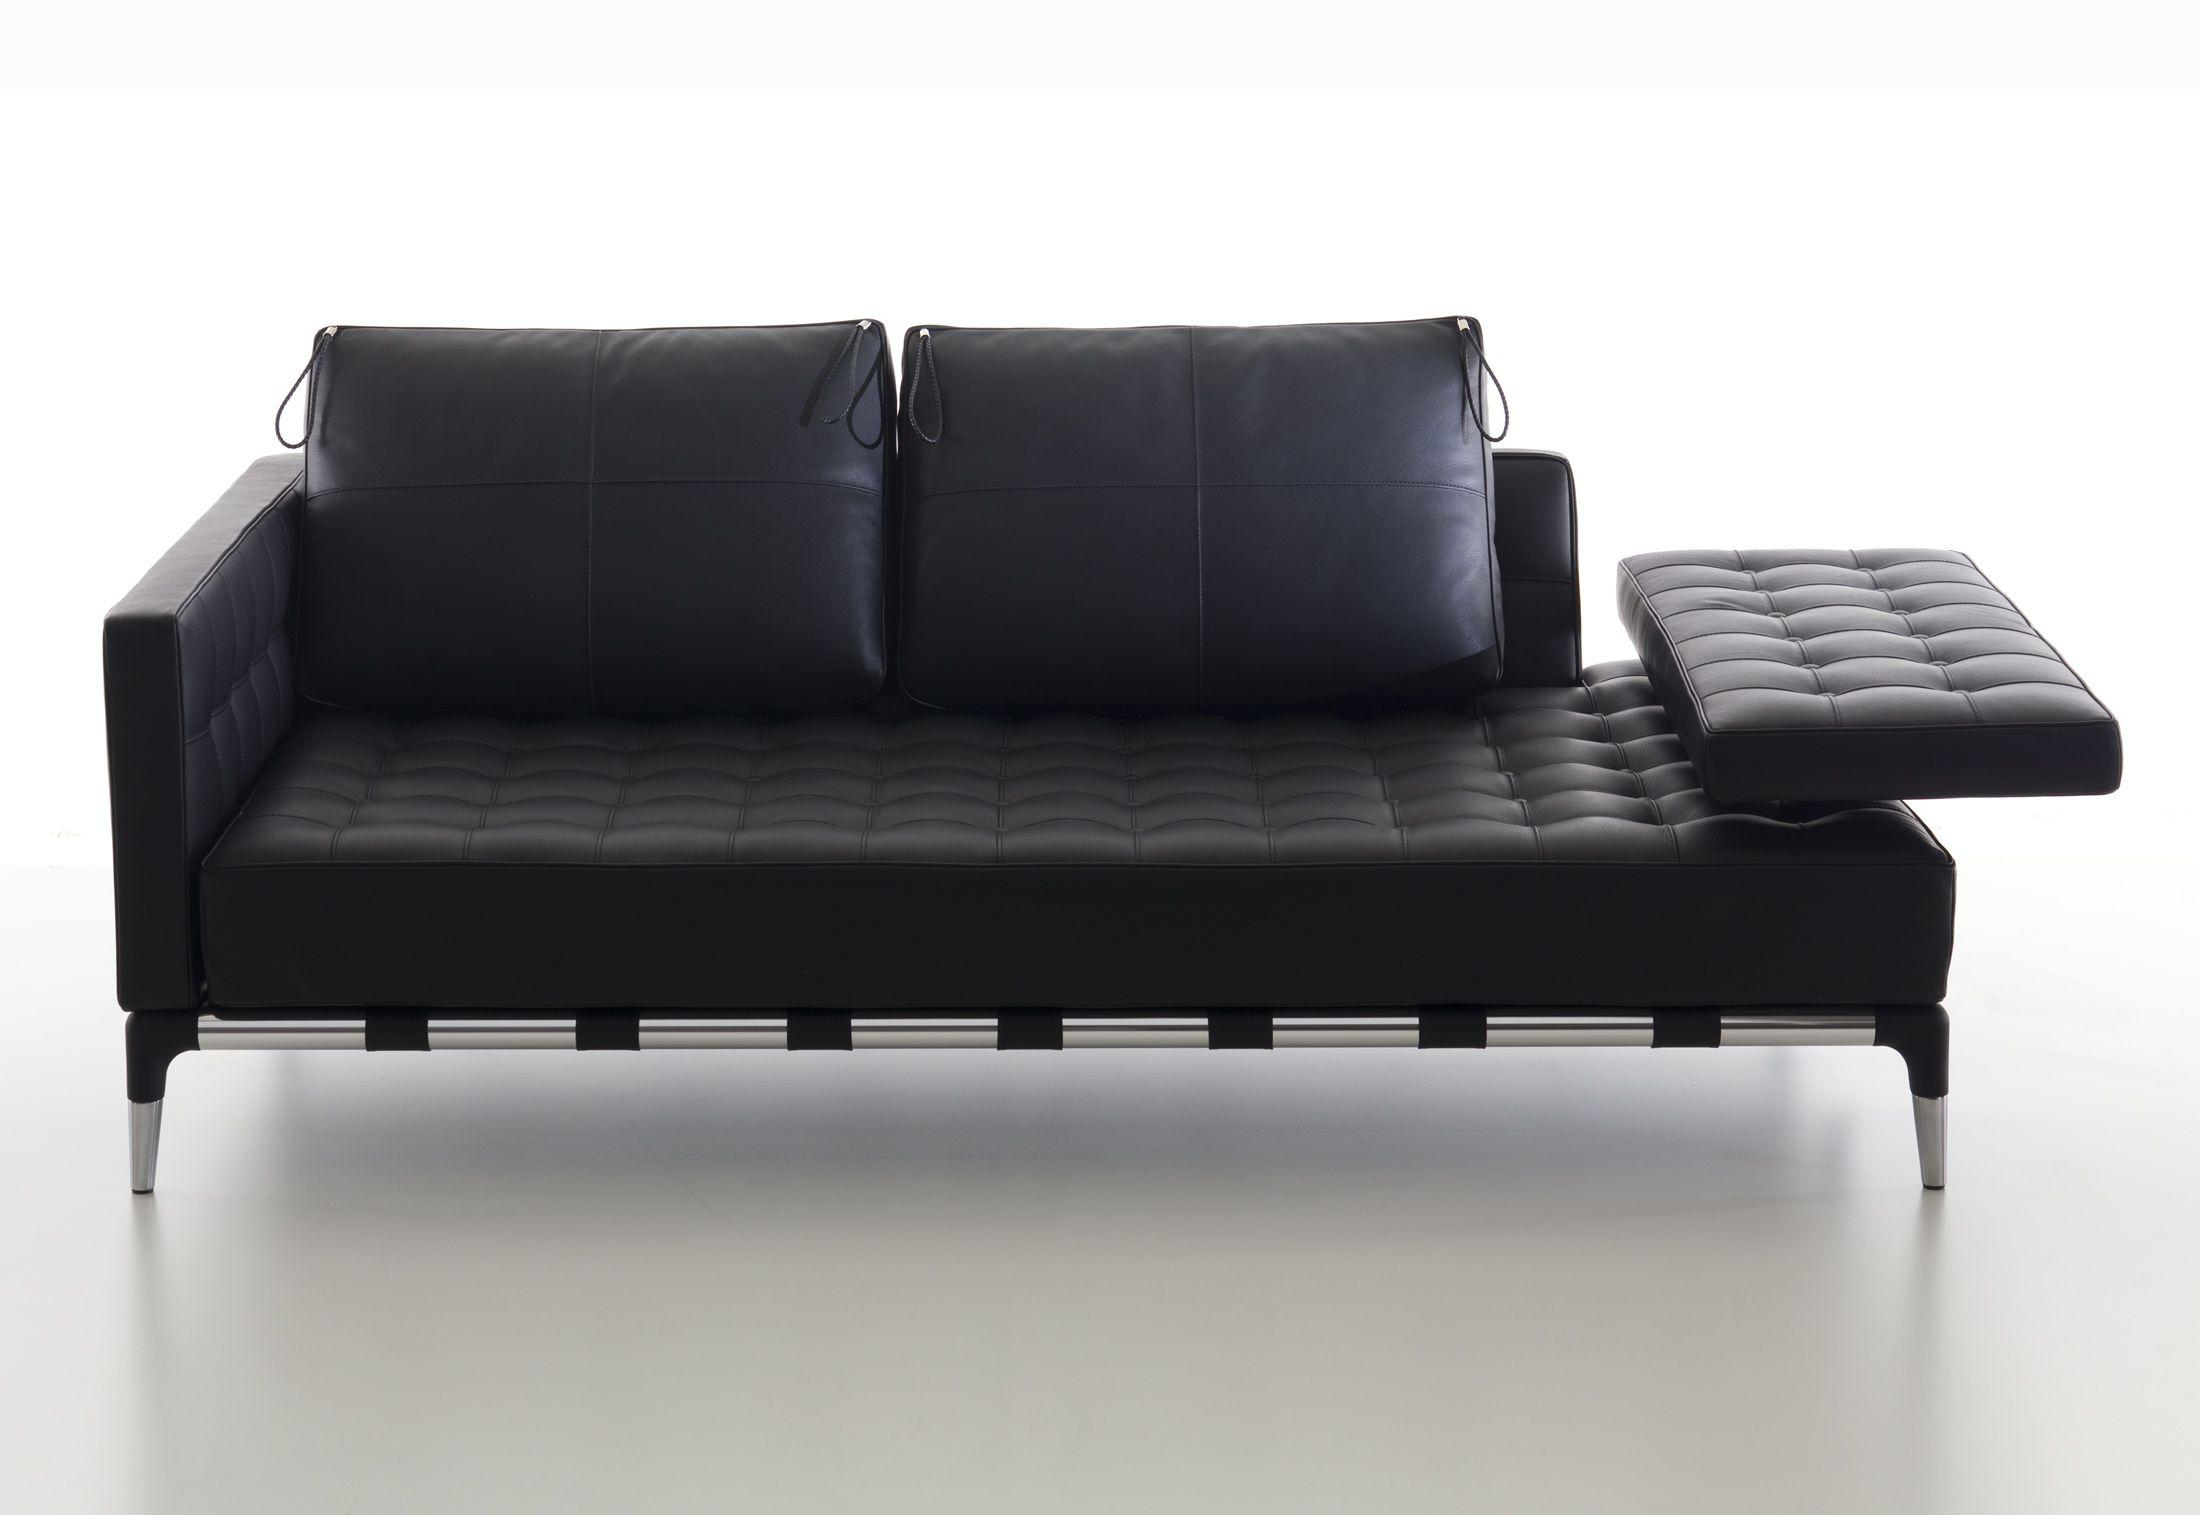 cassina priv sofa philippe starck office furniture and. Black Bedroom Furniture Sets. Home Design Ideas